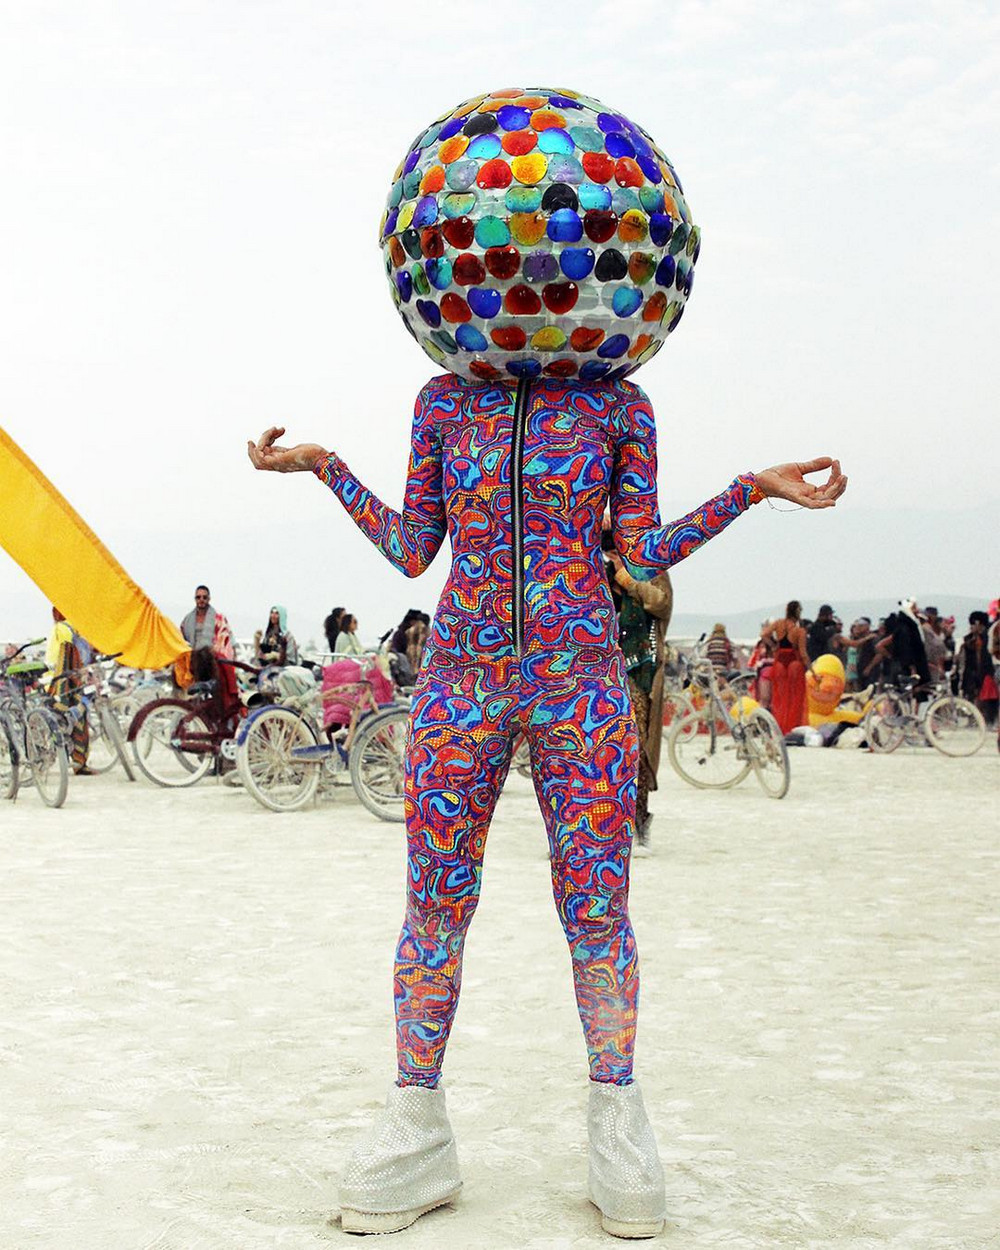 fotografii-festivalya-Burning-Man-2018_3